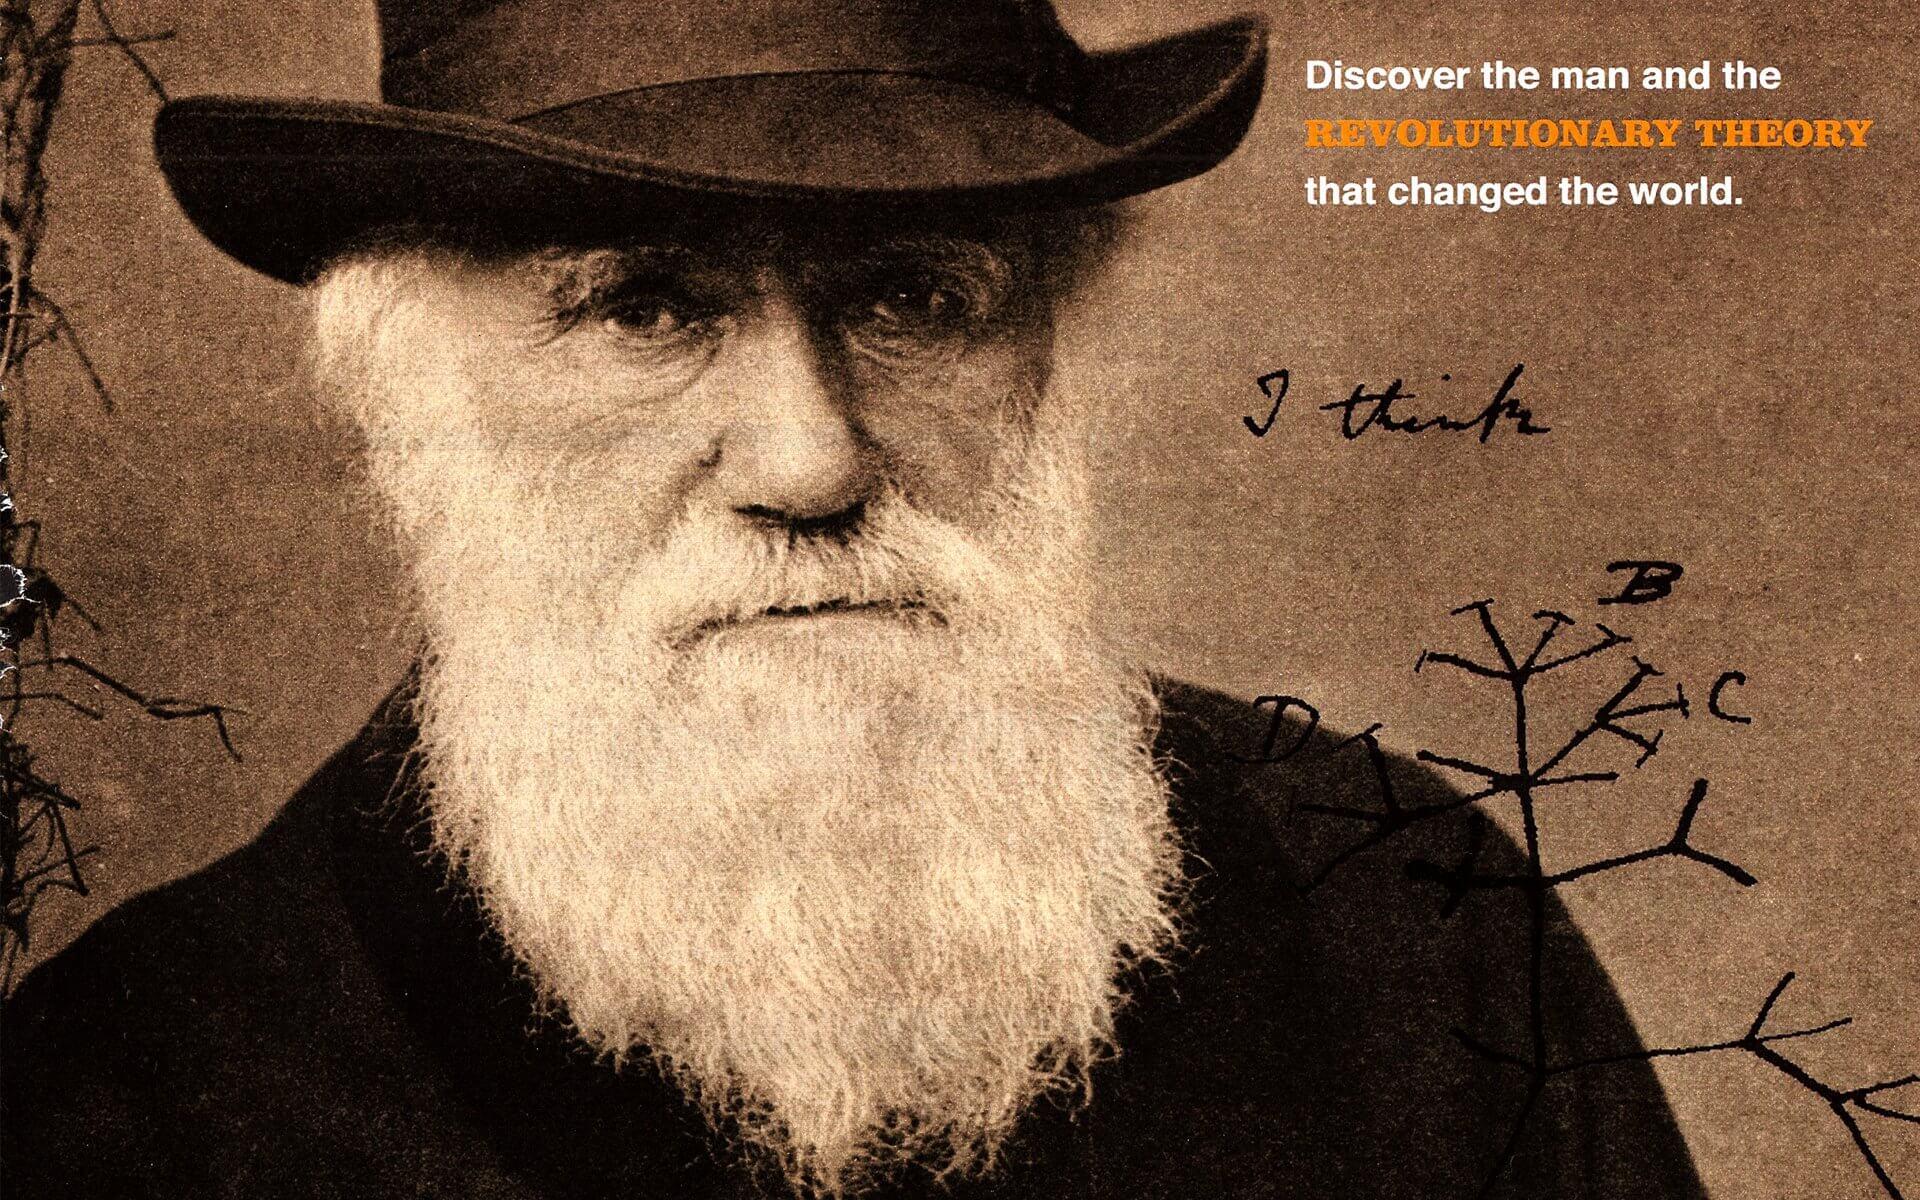 10 Characteristics Of Charles Darwin / Who was Charles Darwin?